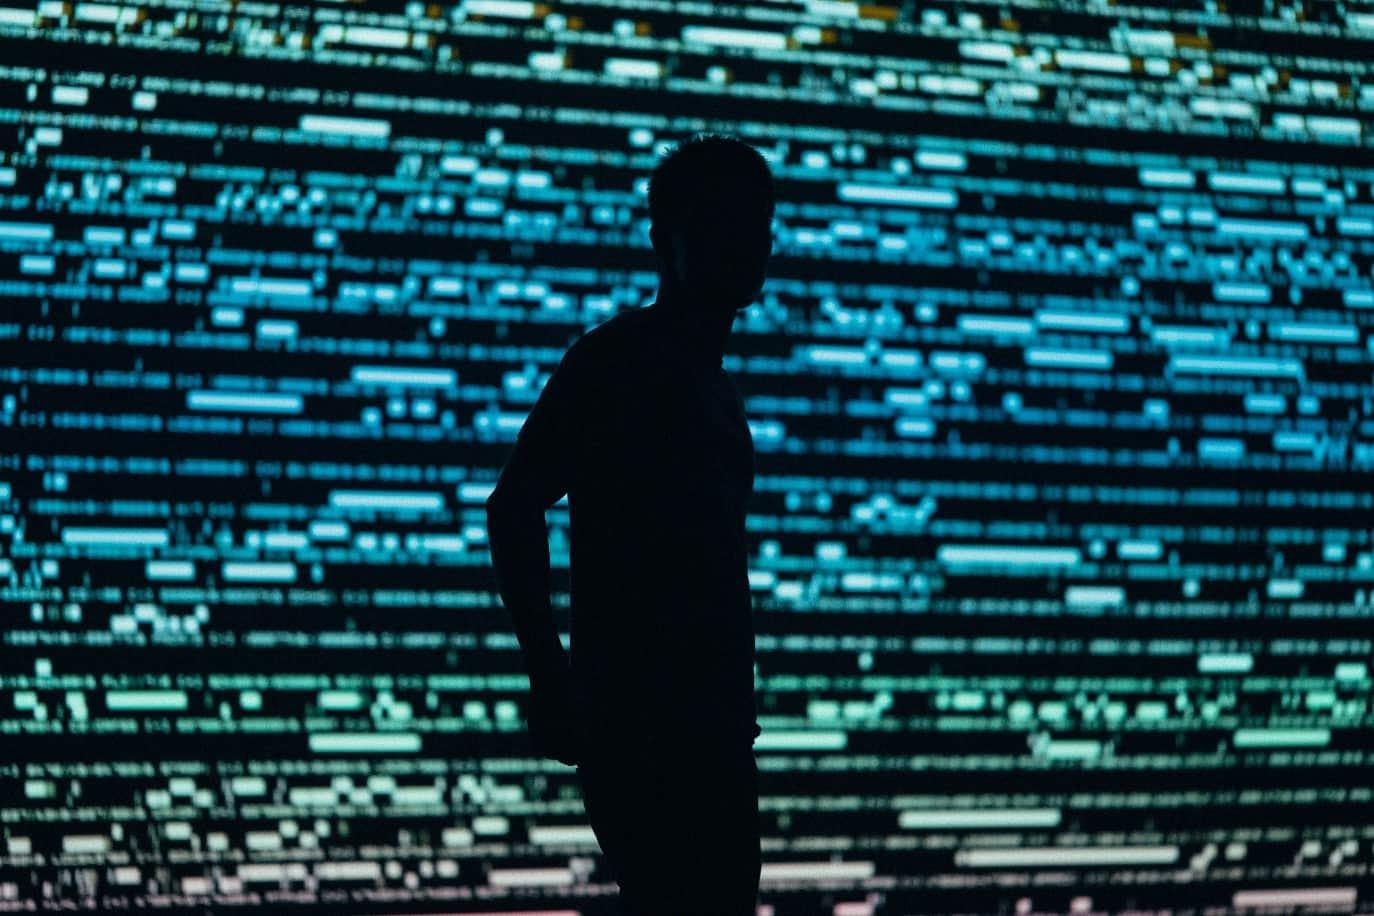 </em><em>暗网的危险和威胁